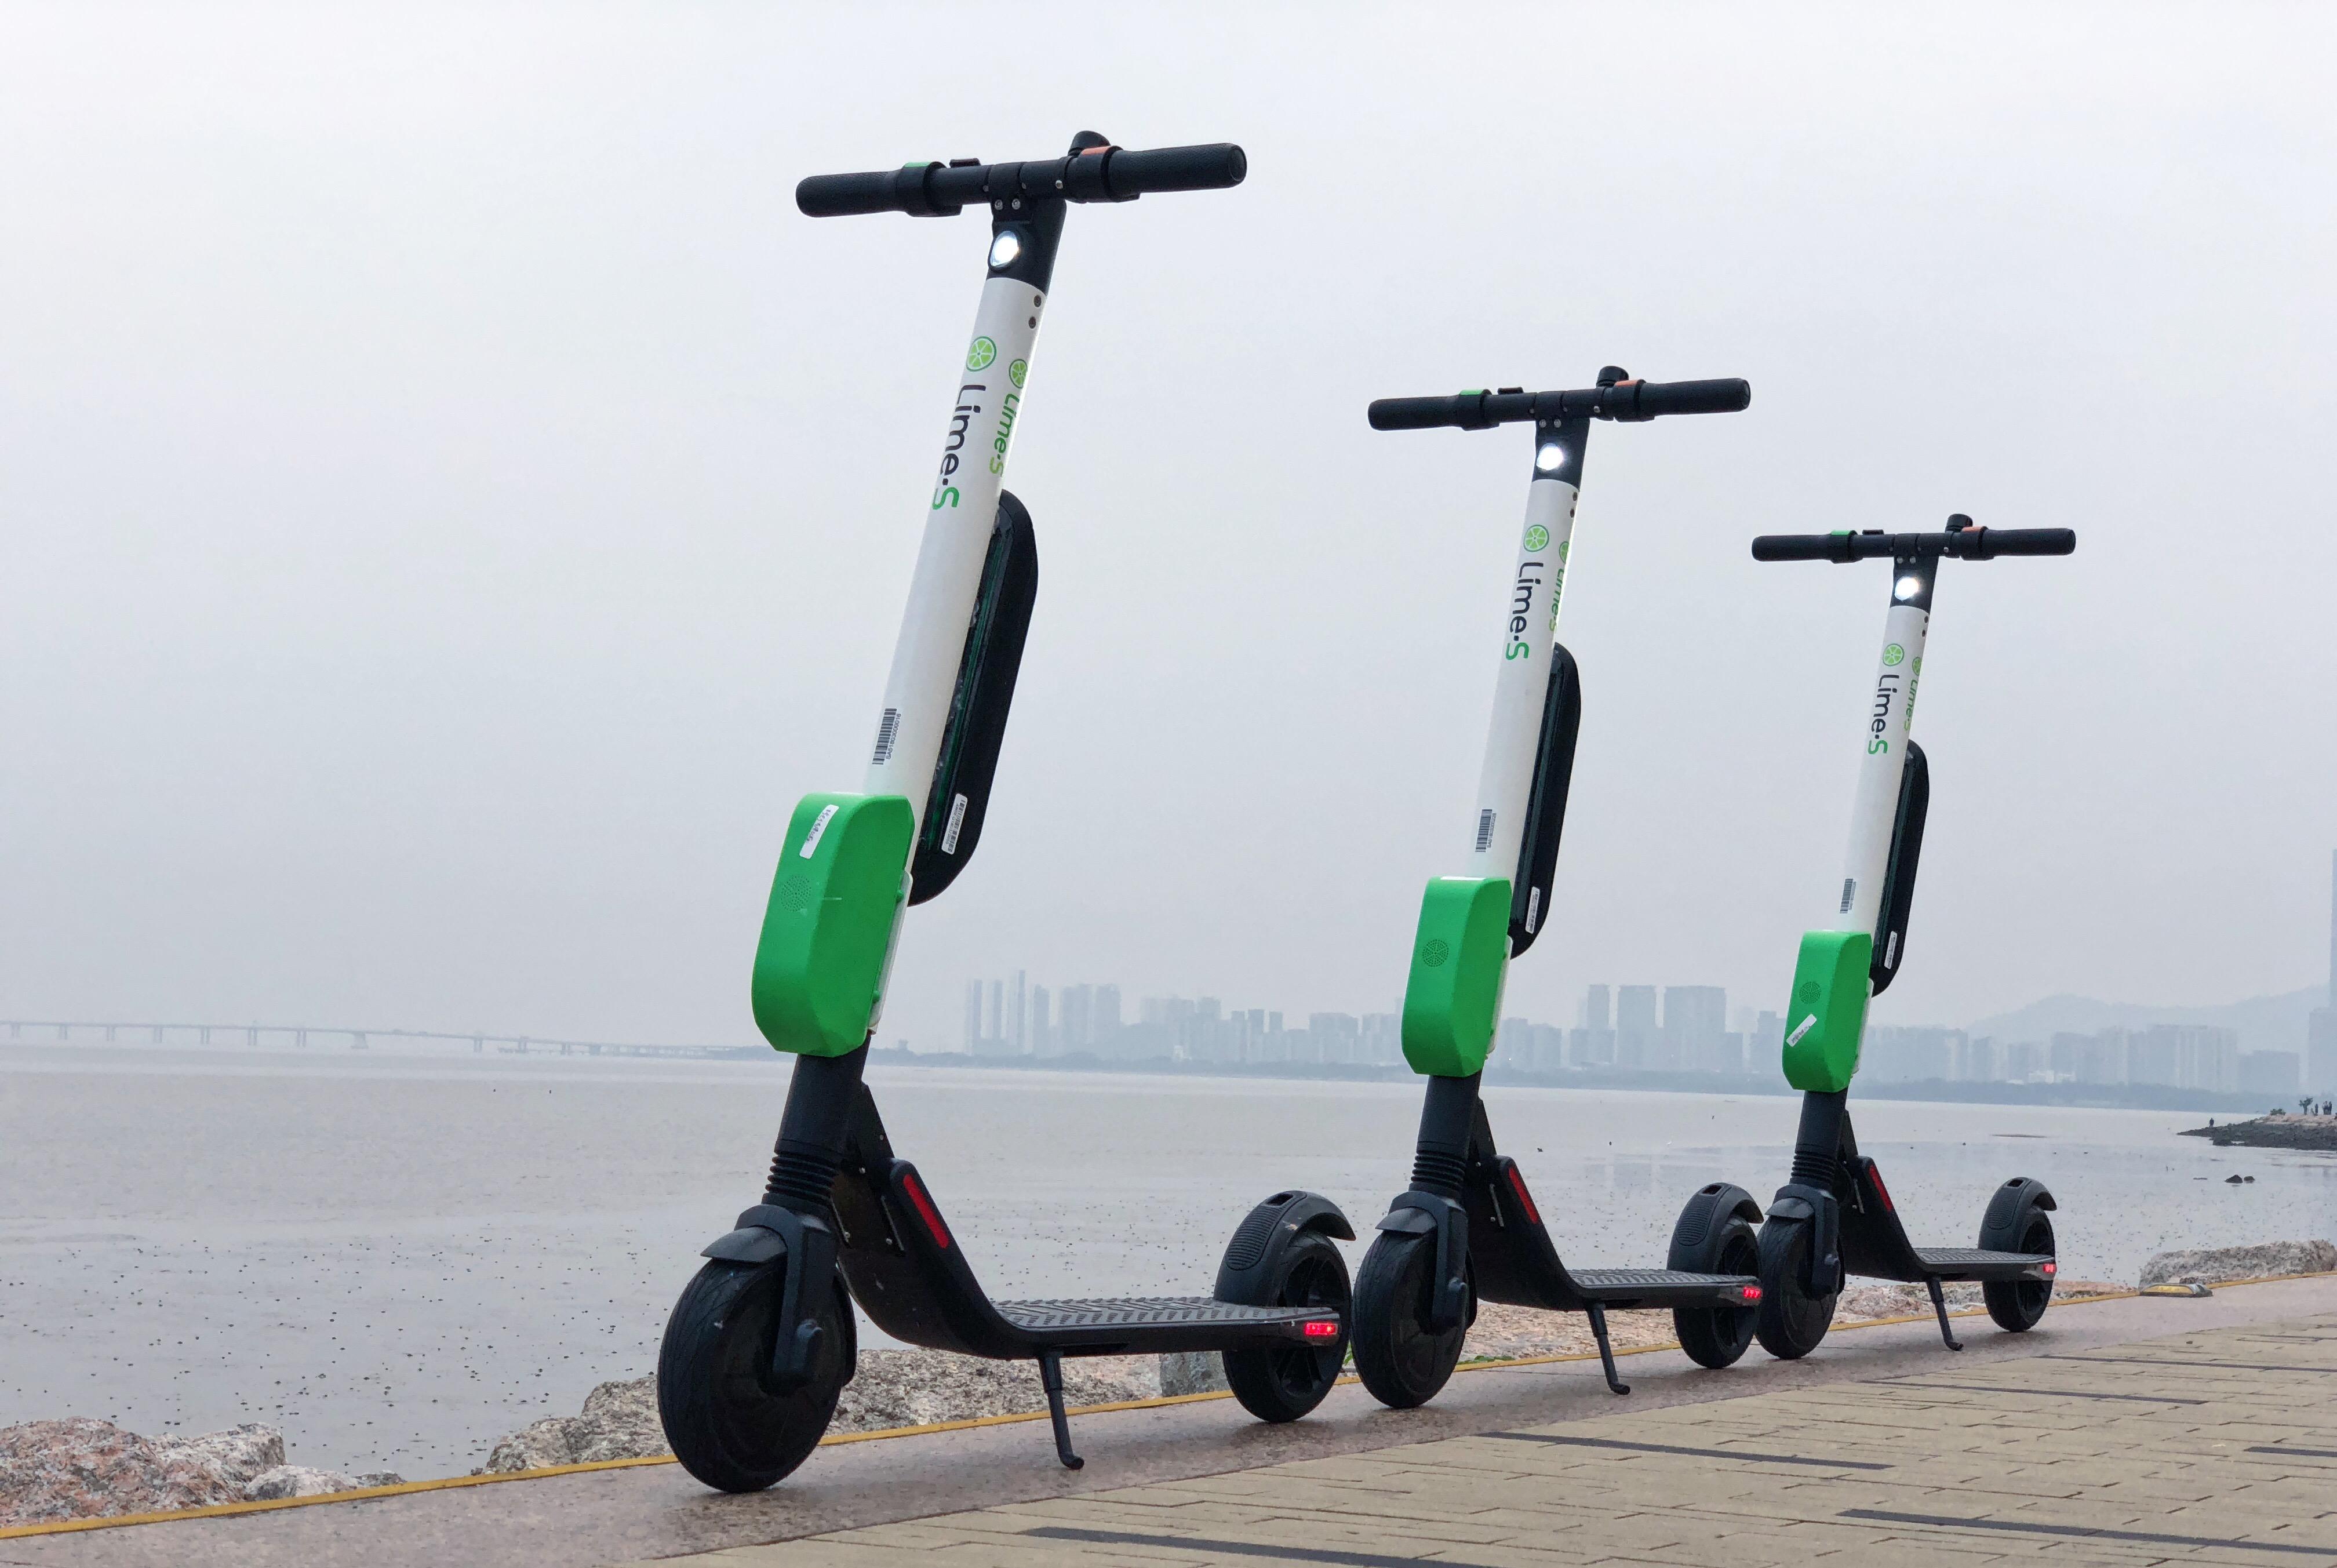 taotao electric scooter wiring diagram electric scooter wiring diagram 164 wjy veganactive co popular  electric scooter wiring diagram 164